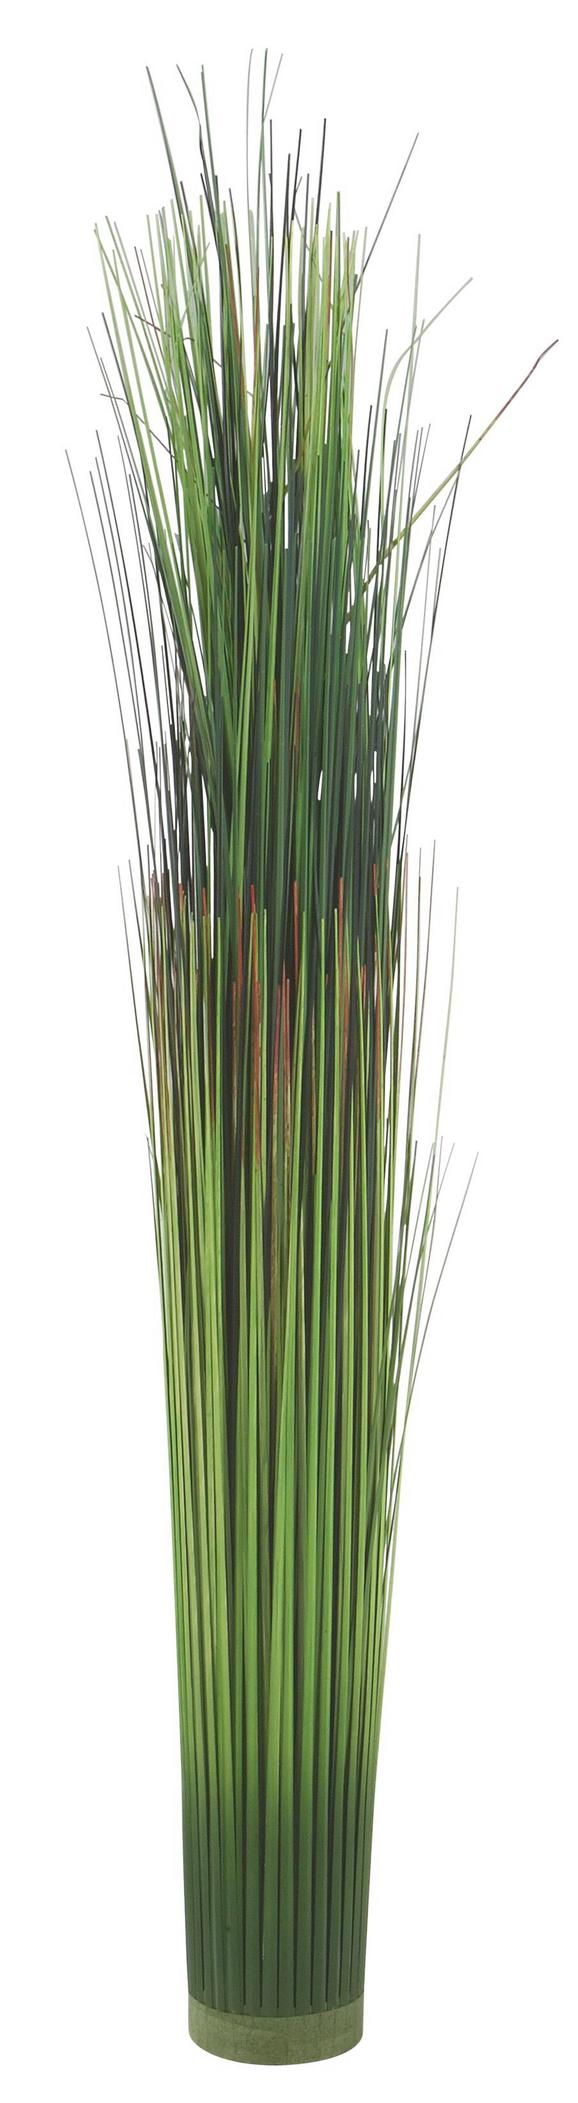 Grasbündel Markus in Grün - Grün, Kunststoff (75cm)